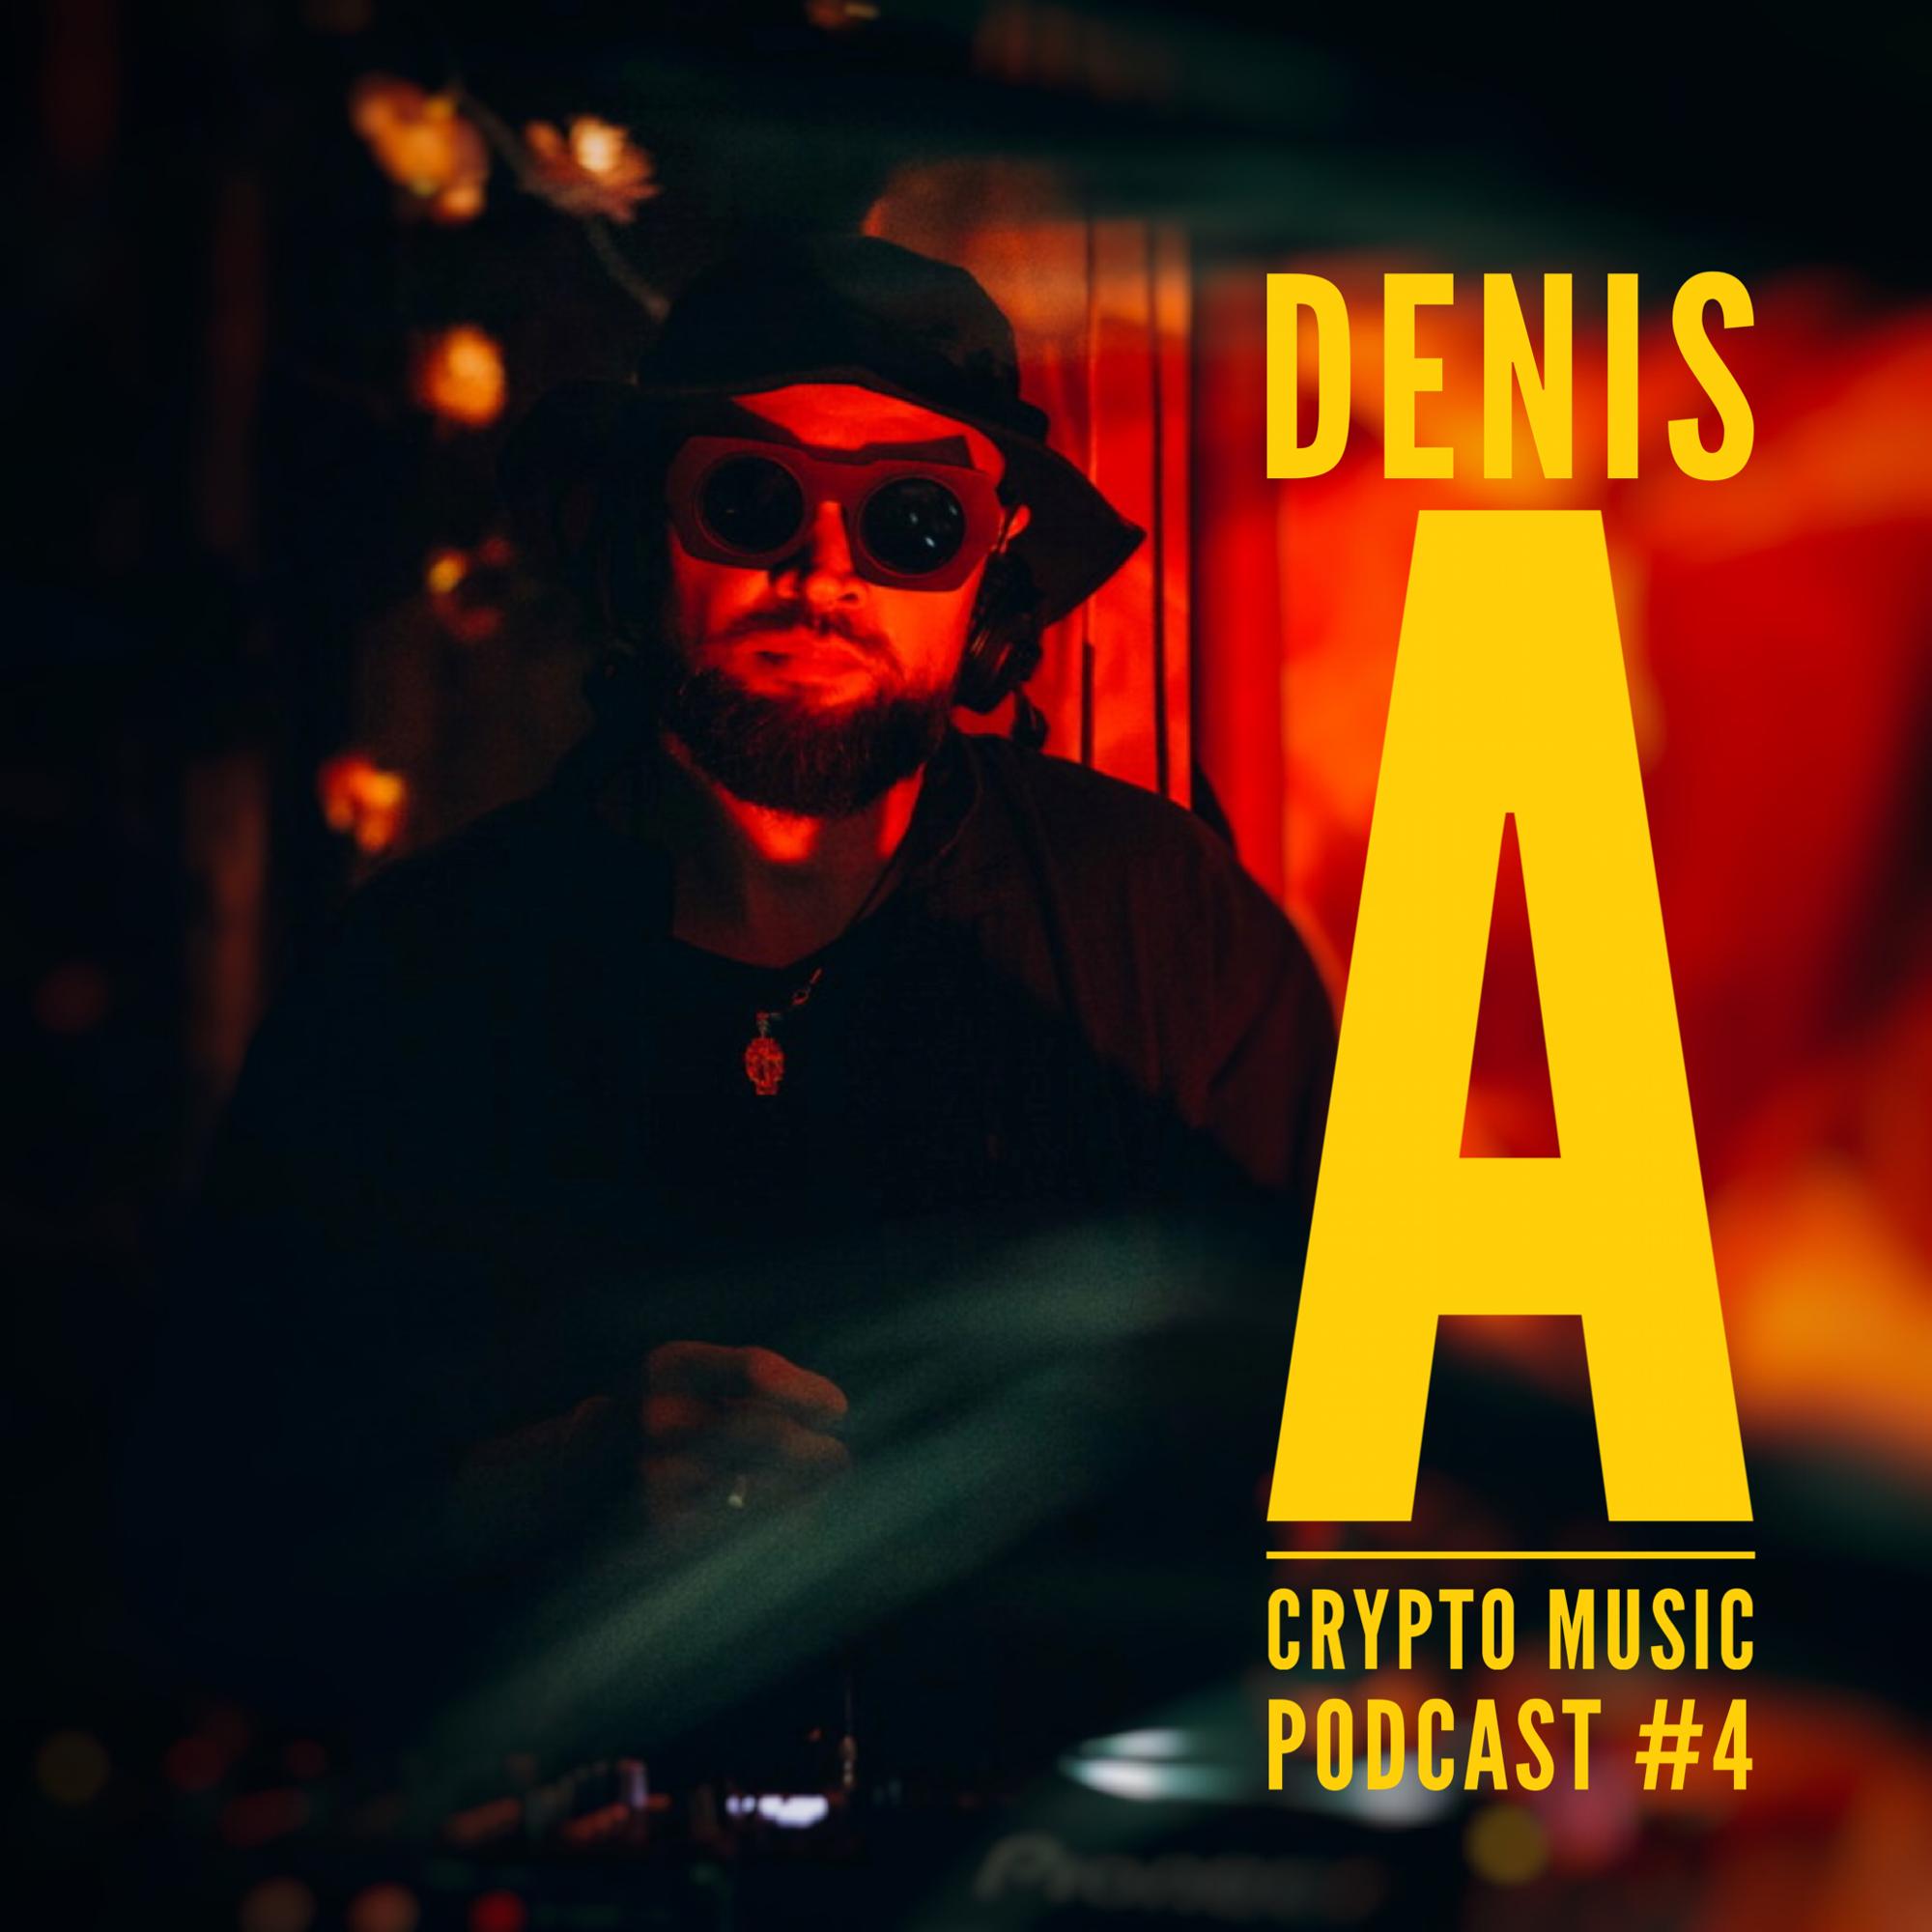 DENIS A - DAR SESSIONS